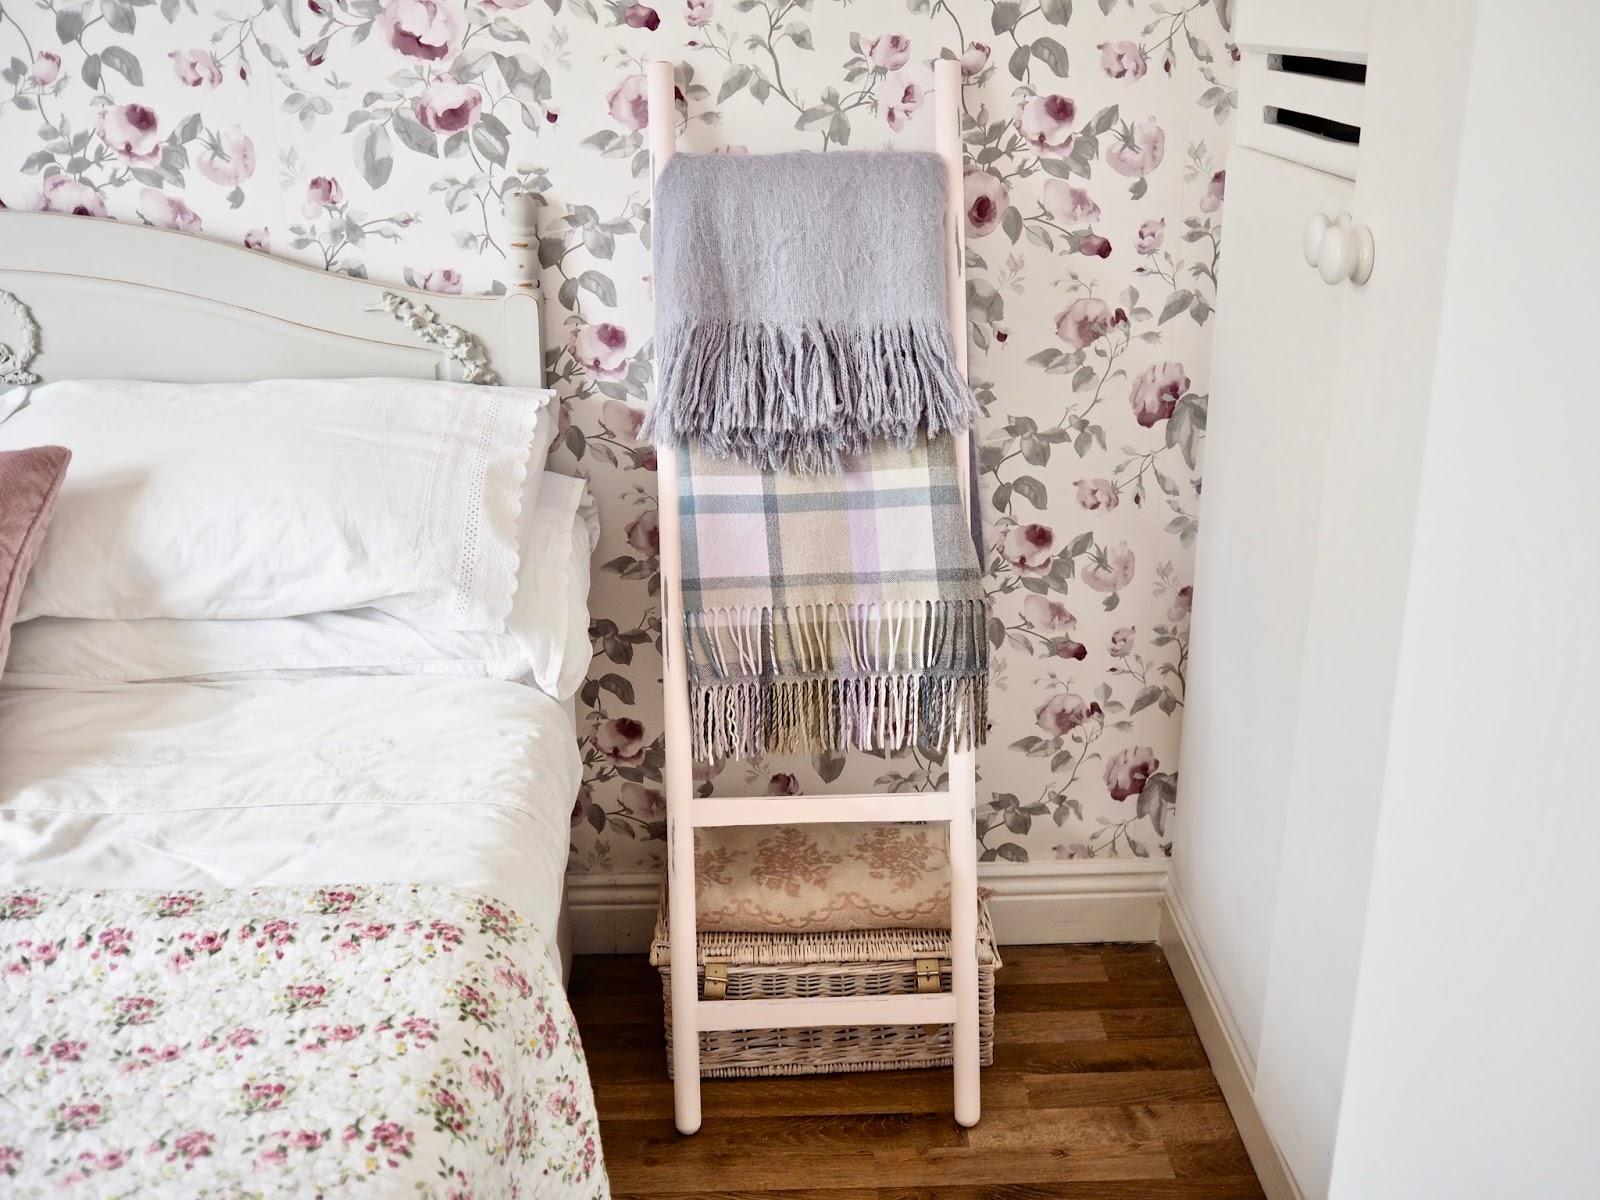 Ikea Hack Diy Blanket Ladder Dainty Dress Diaries